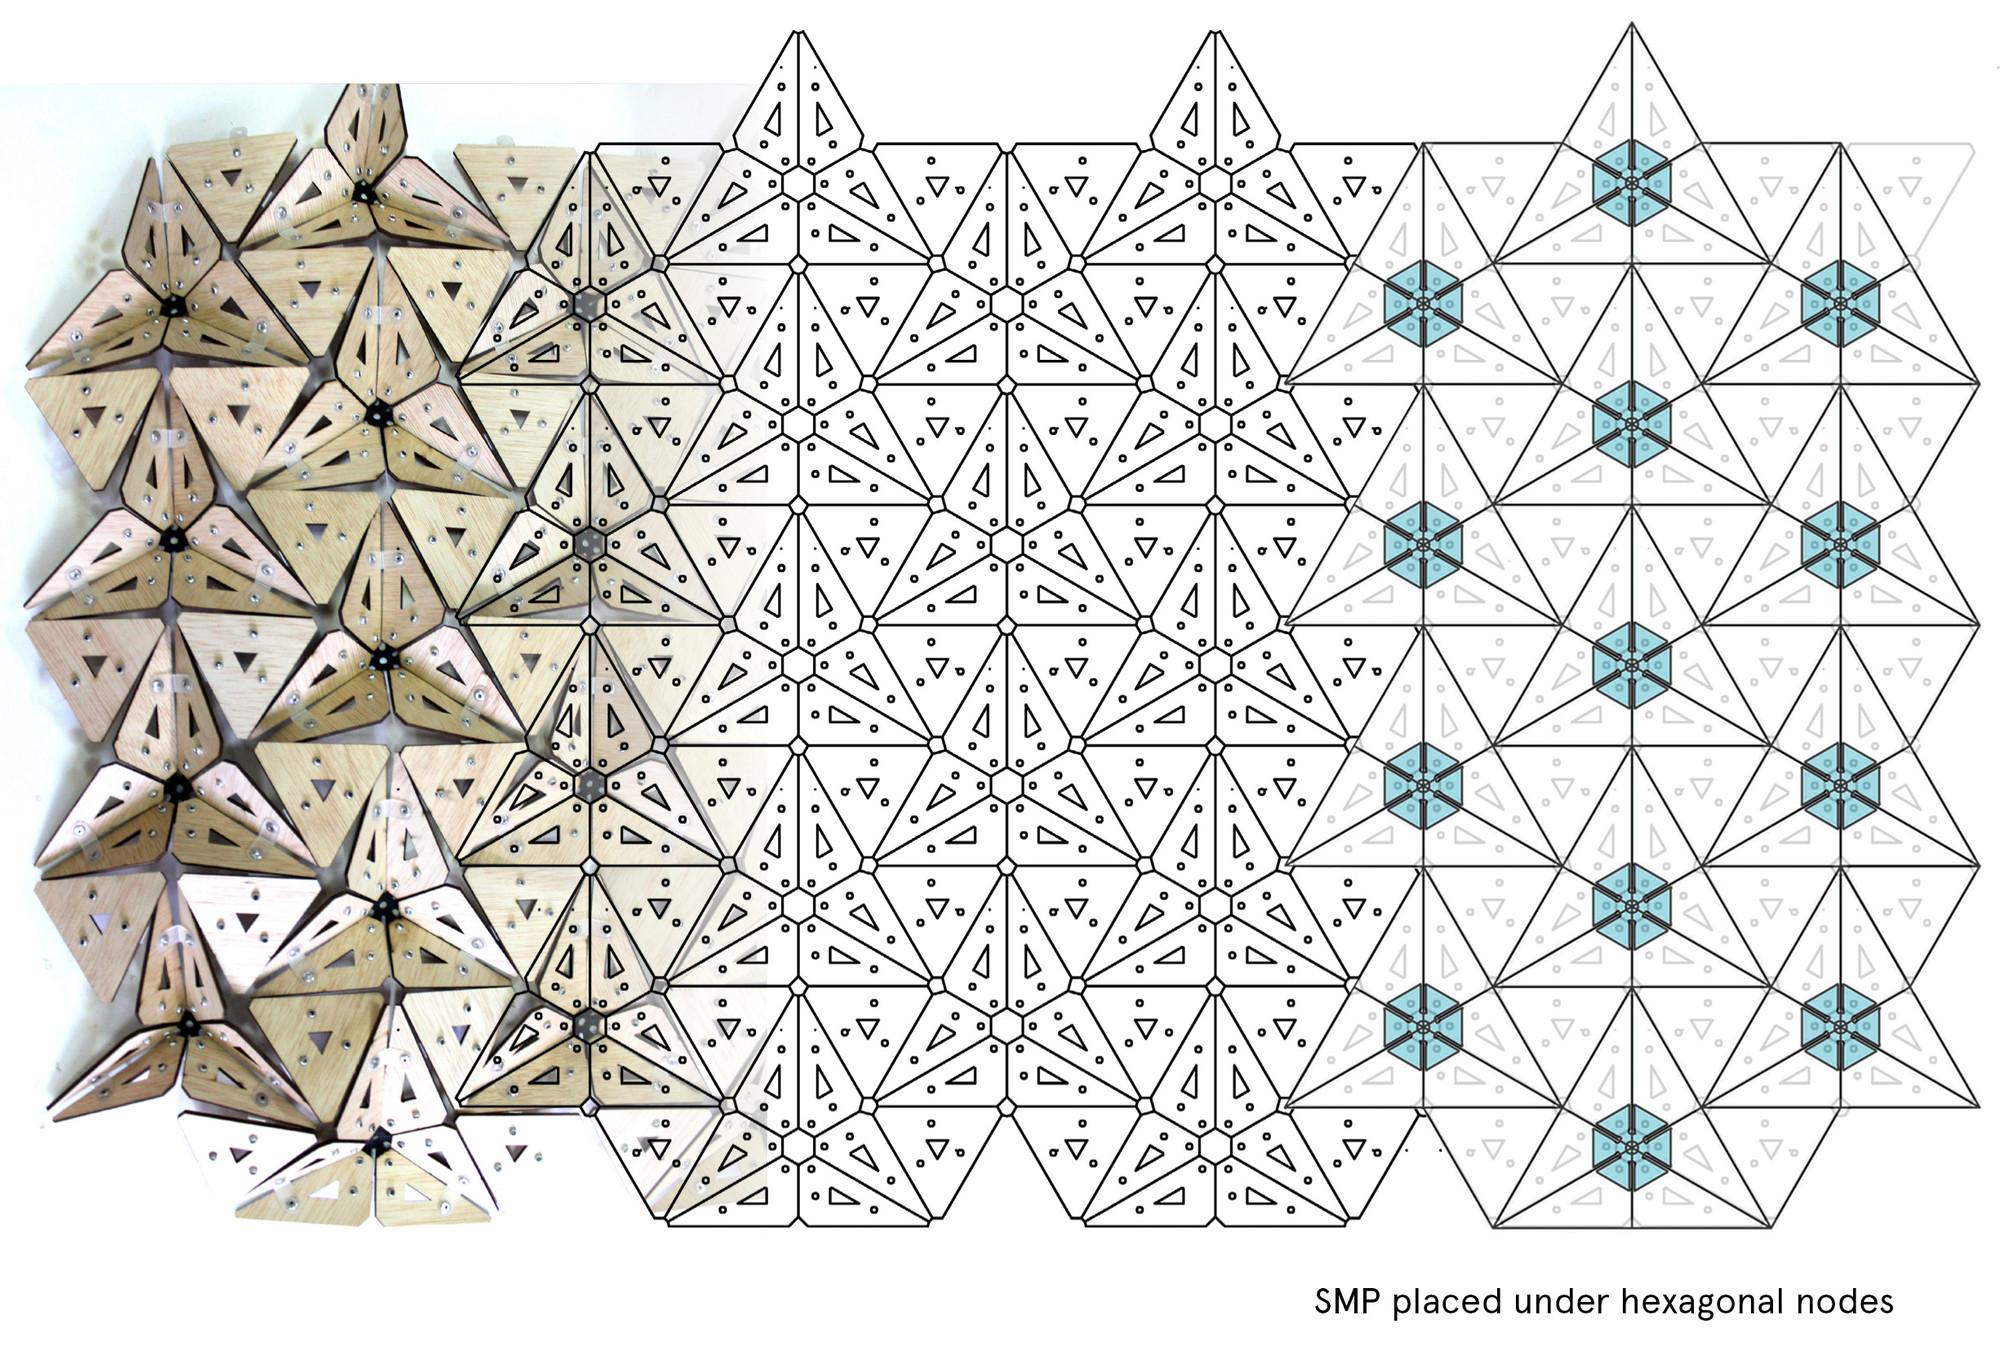 Diagrama / Prototipo. Image Cortesia de © IaaC (Instituto de Aquitectura Avanzada de Catalunya) / Ece Tankal, Efilena Baseta, Ramin Shambayati